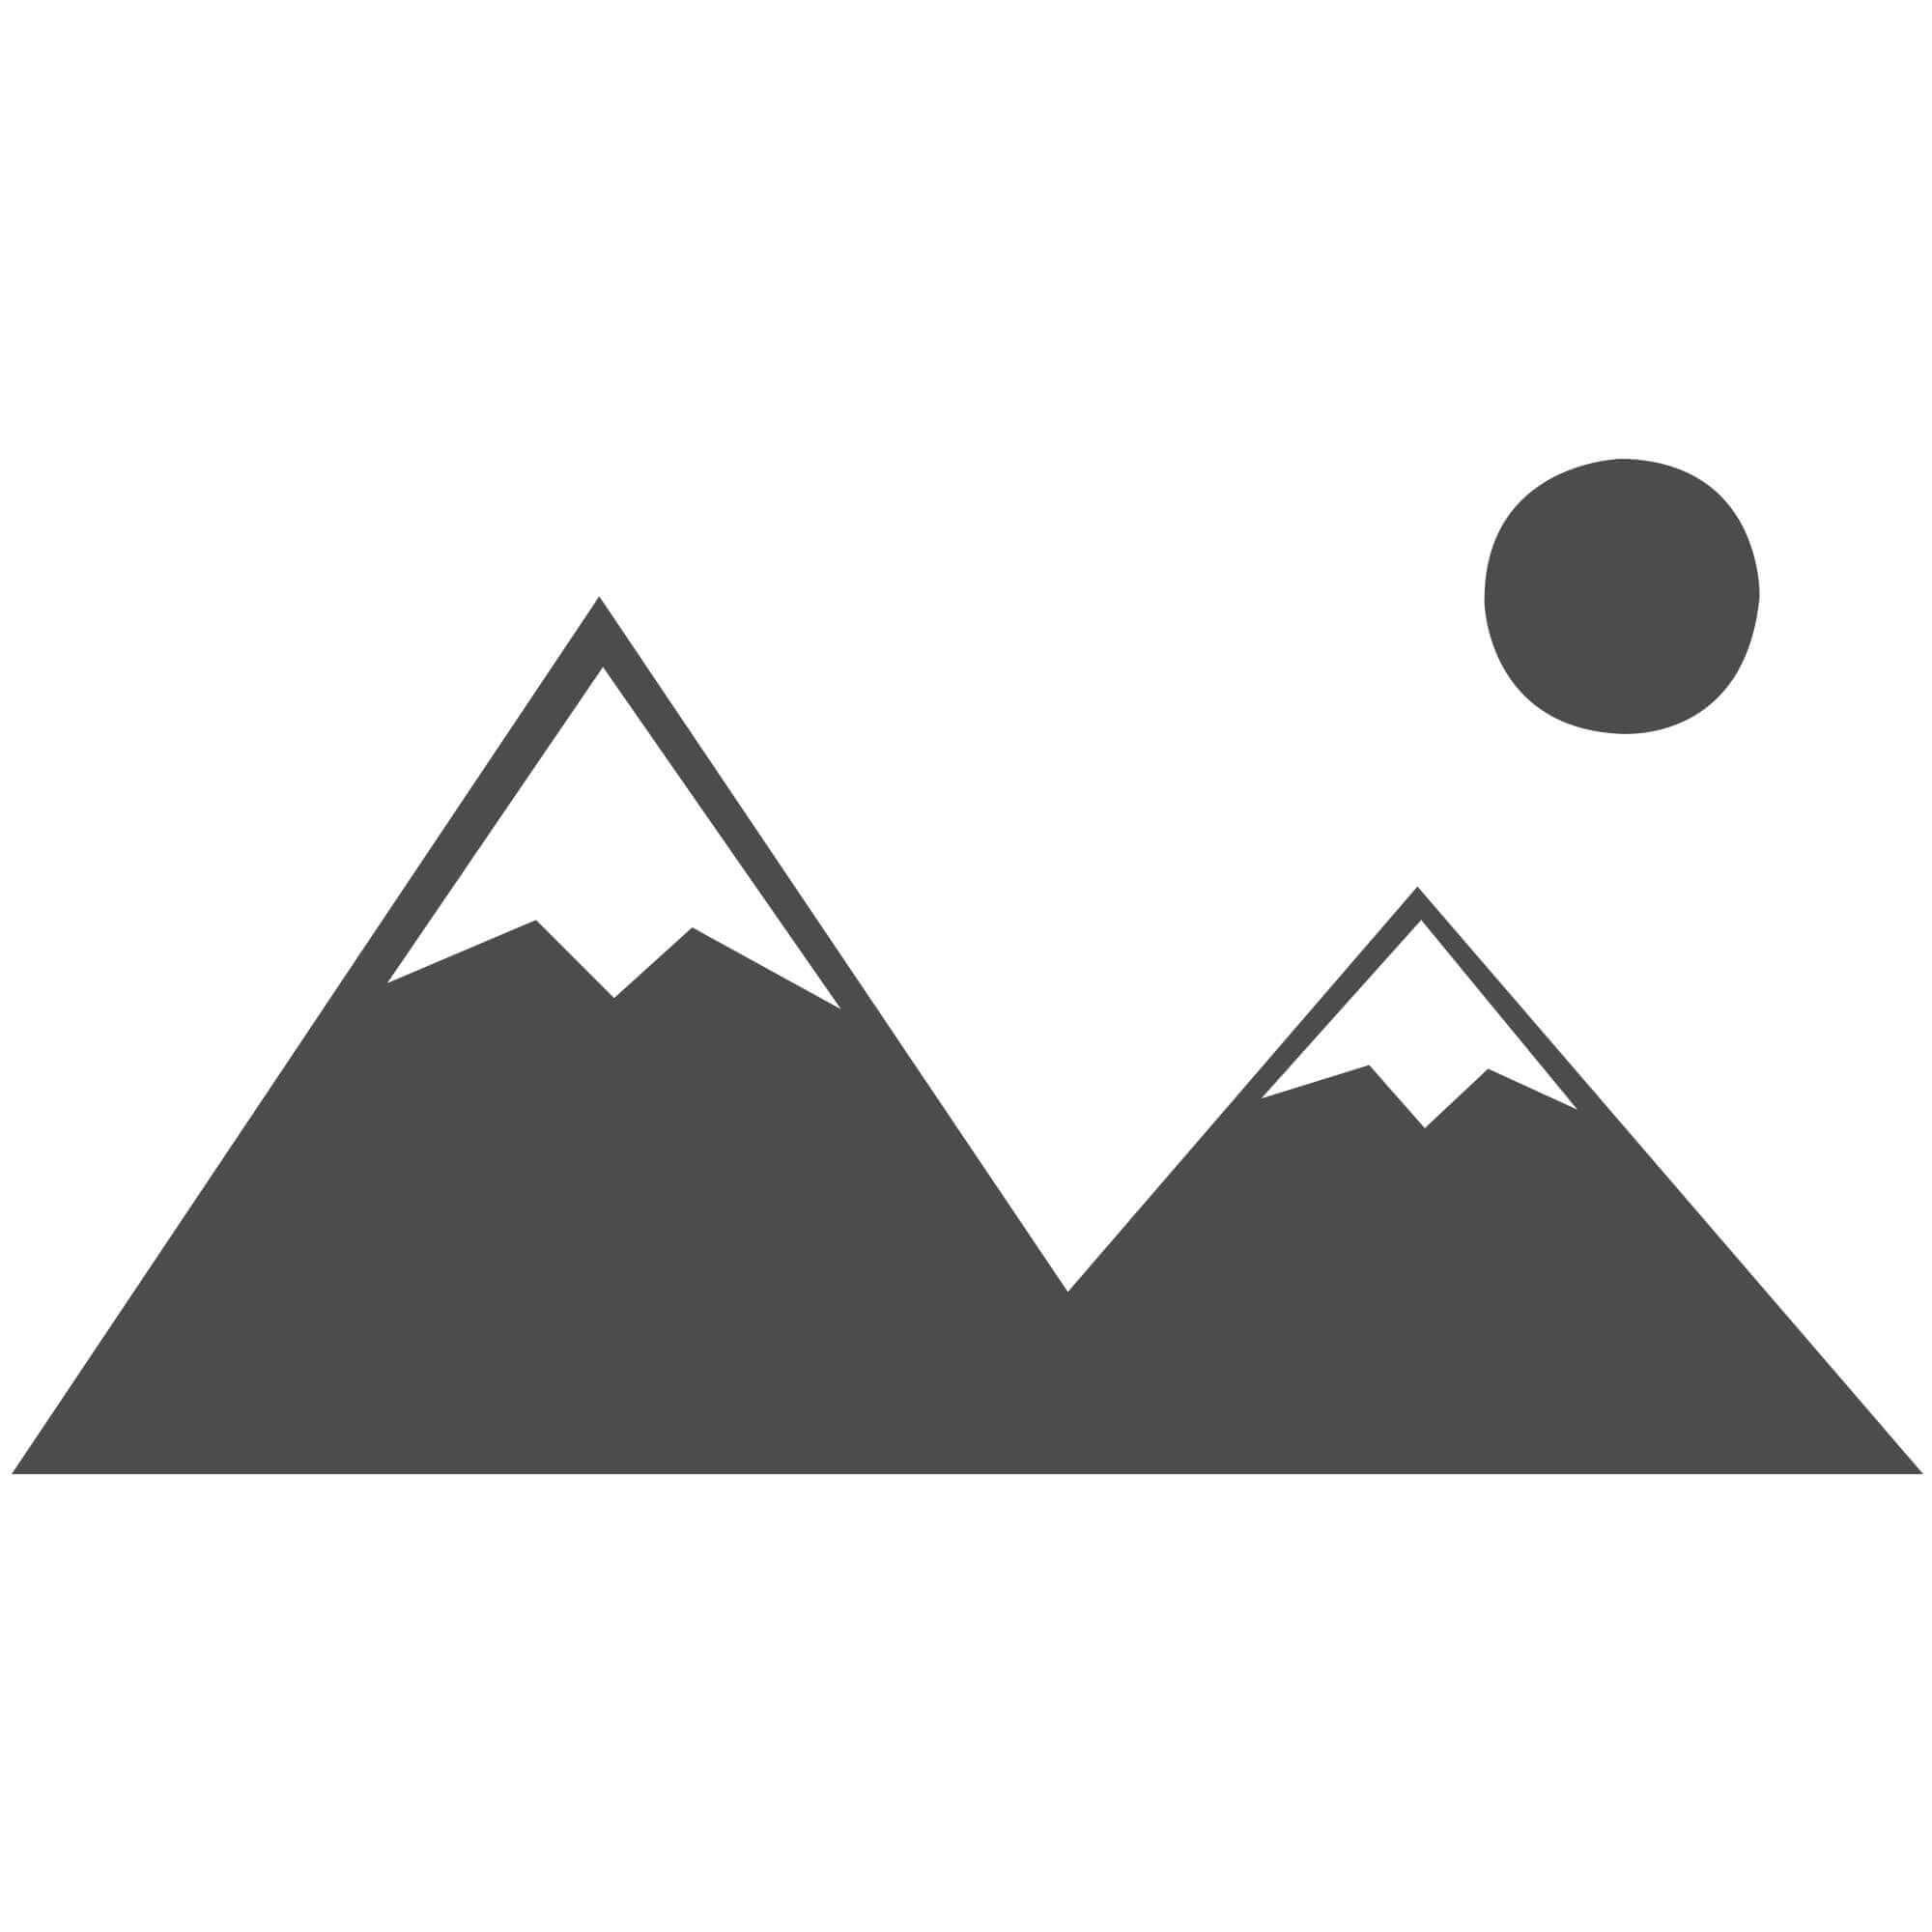 Mayfair Dorchester Grey Rug - Size Circle 150 cm (5')